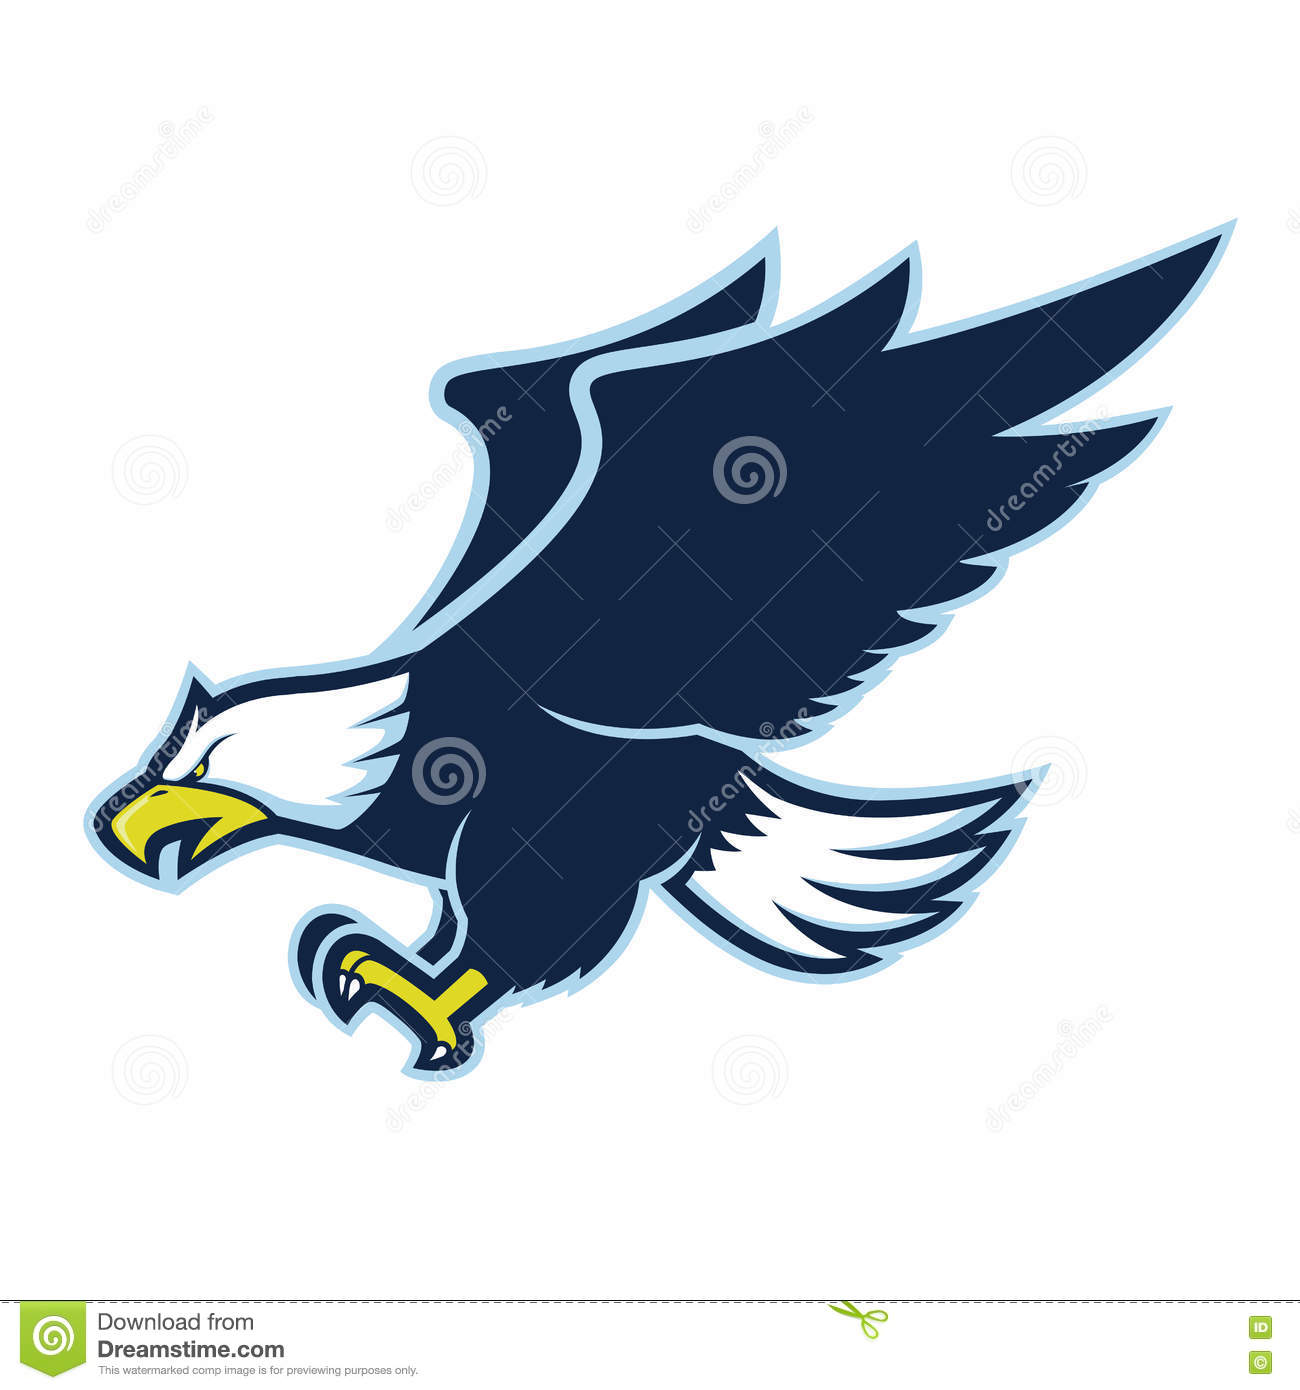 Flying eagle mascot stock vector. Illustration of carnivore.